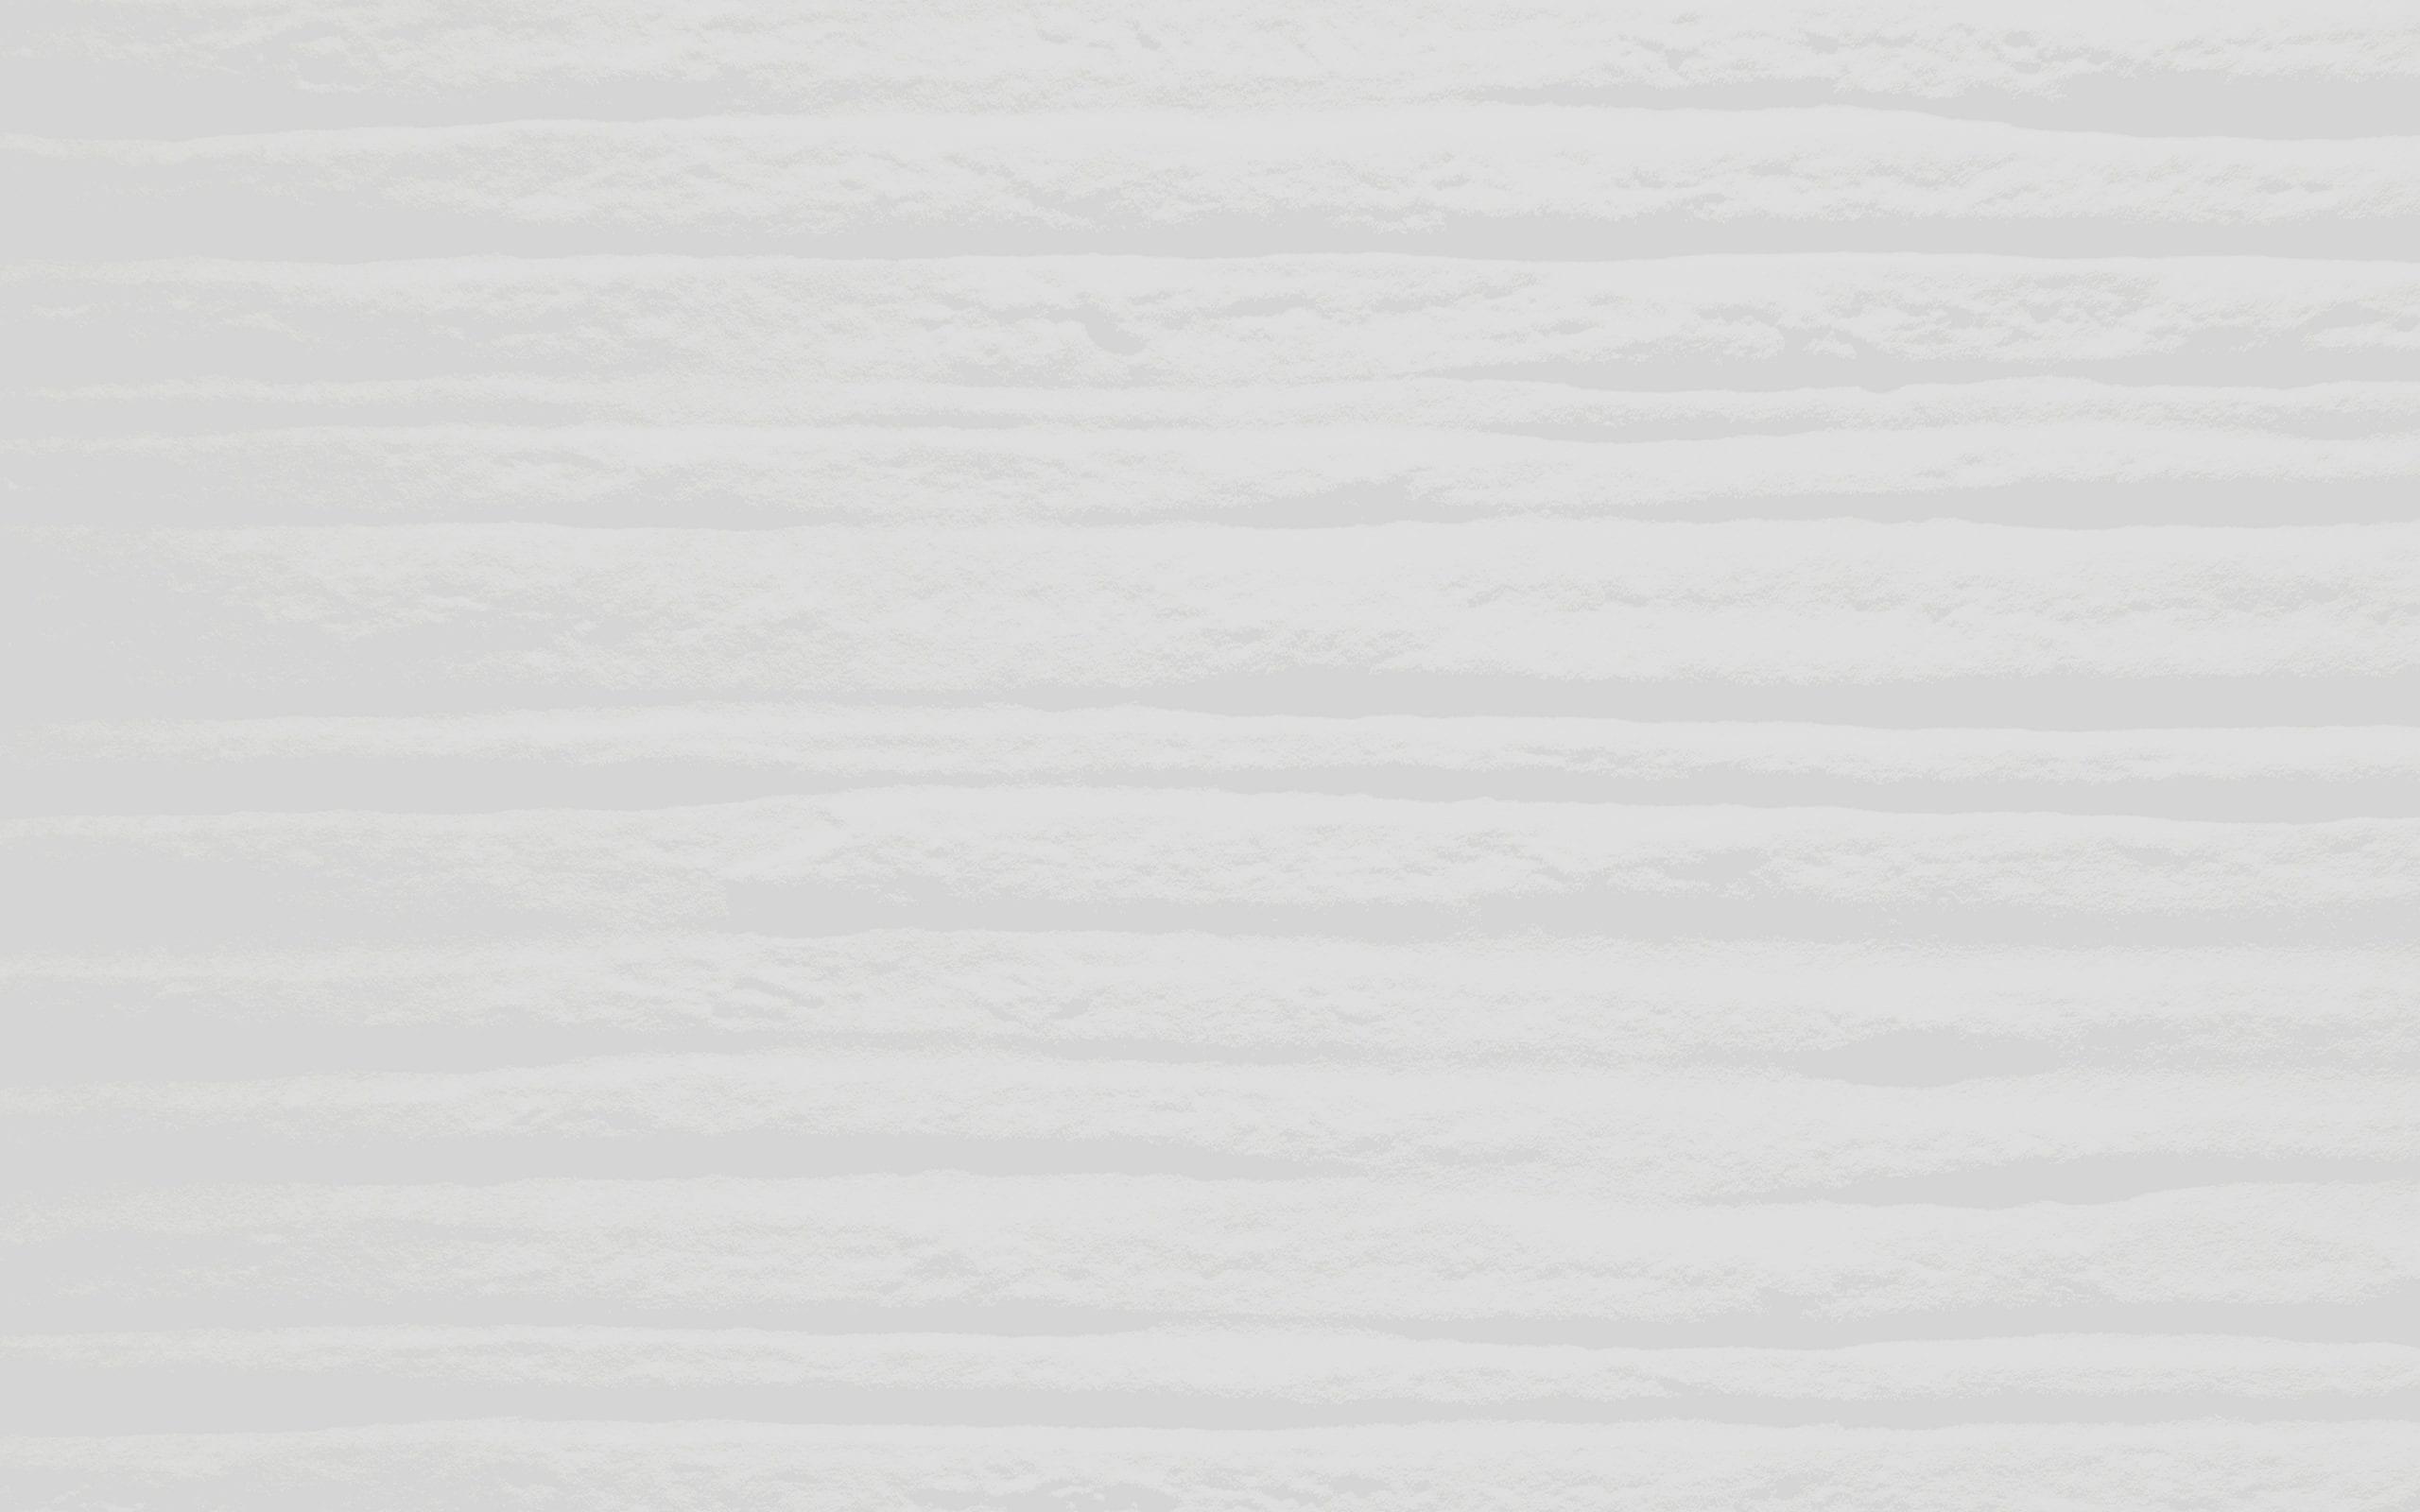 Overlay Background Pattern